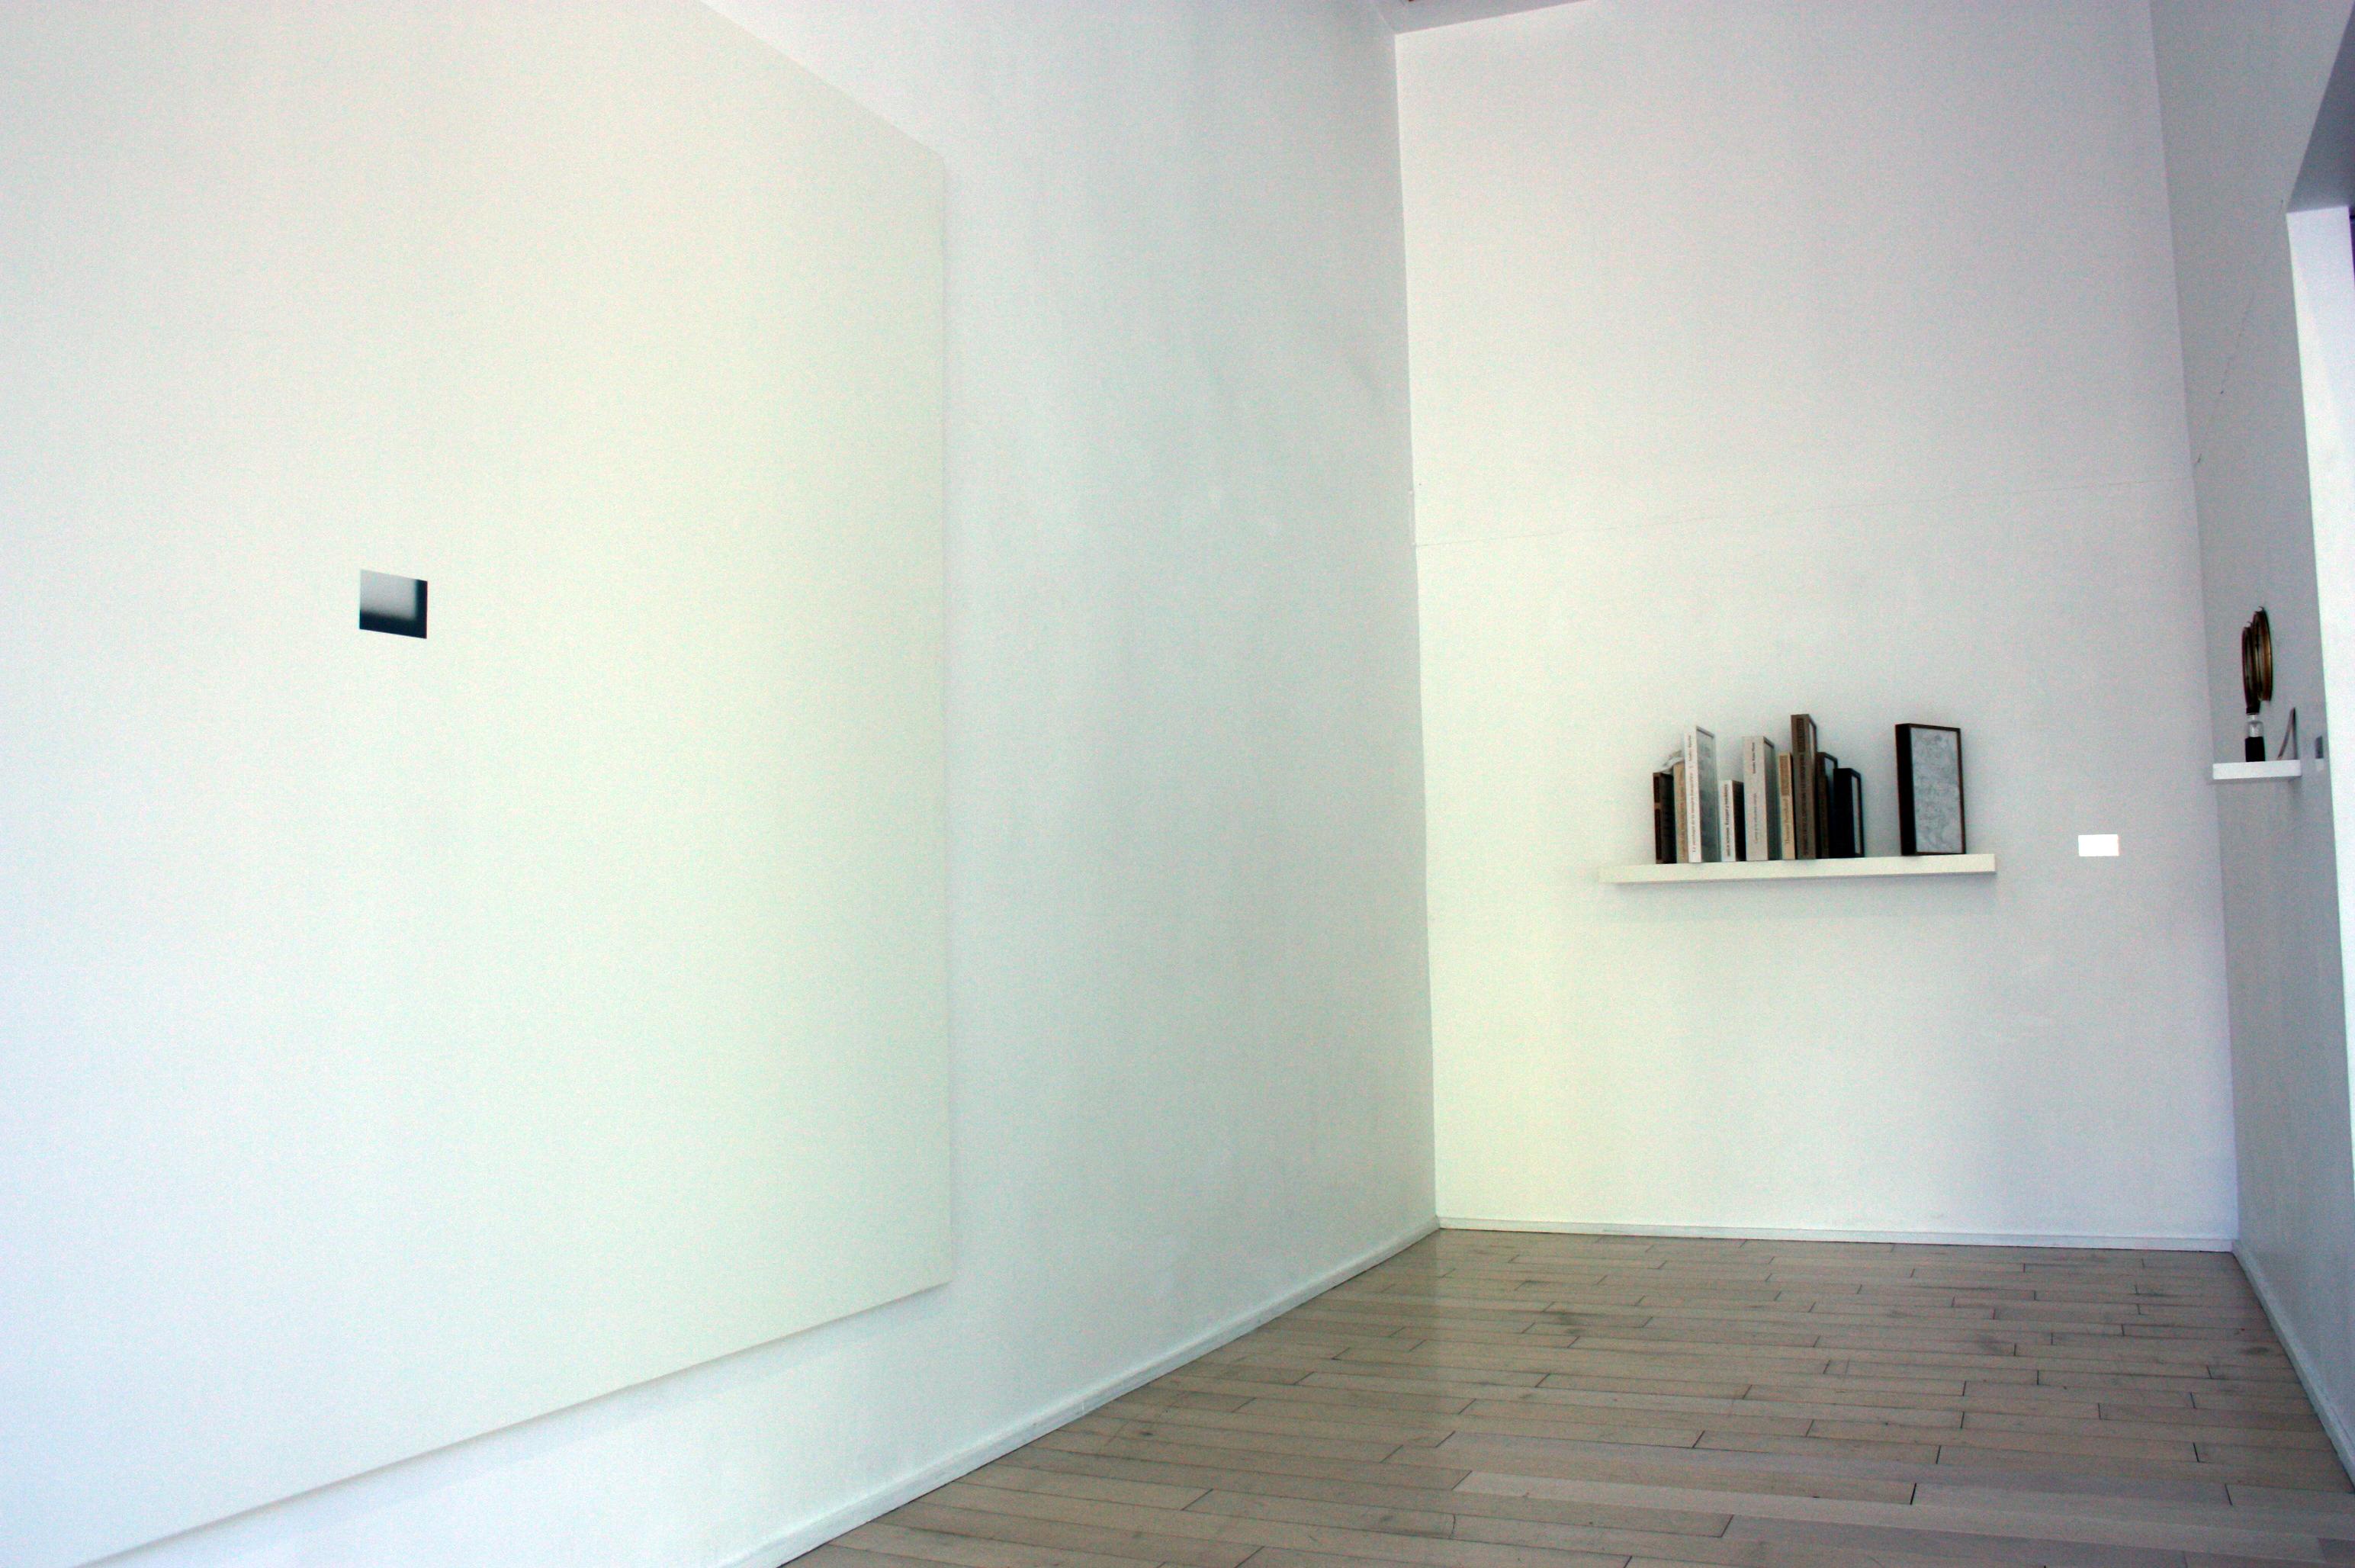 comisariado 1erEscalón galería ArtNueve